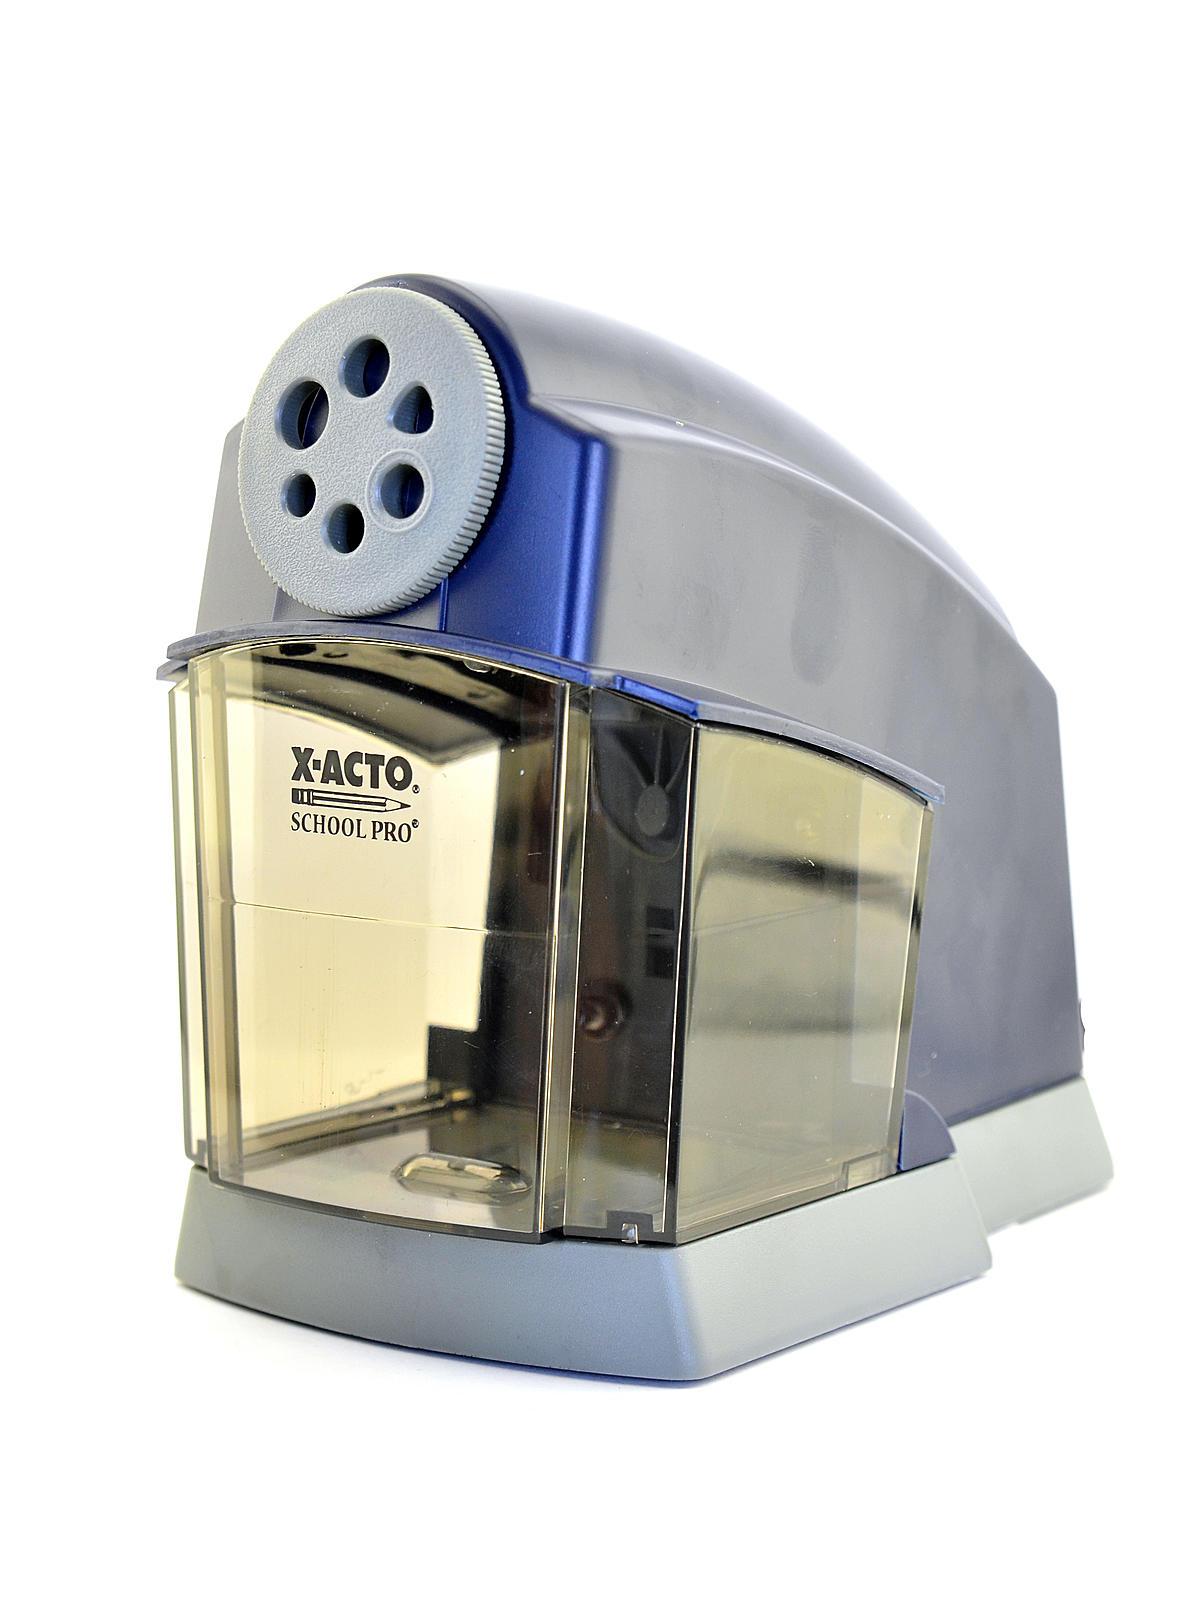 X-Acto Boston School Pro Electric Pencil Sharpener ... X Acto Electric Pencil Sharpener